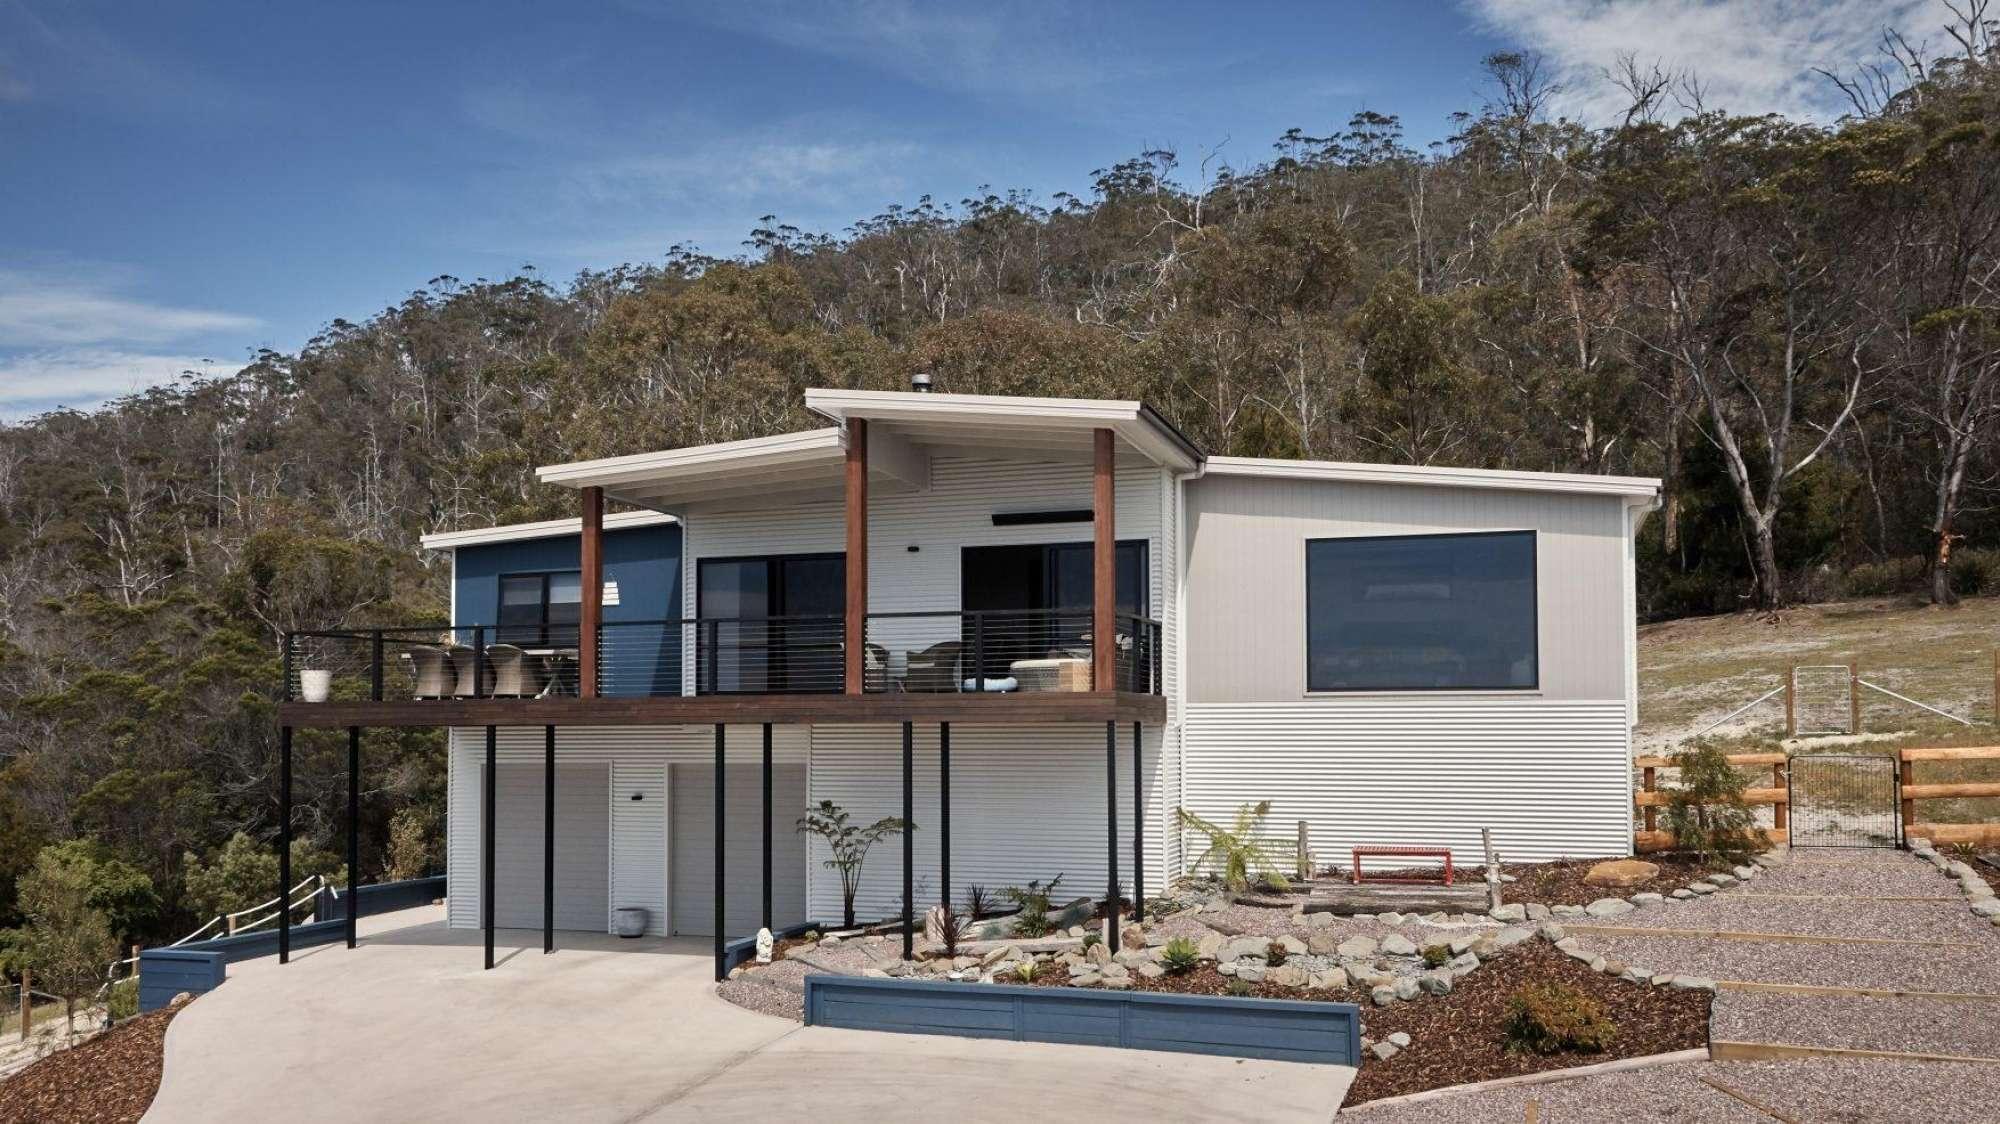 Double garage modular home